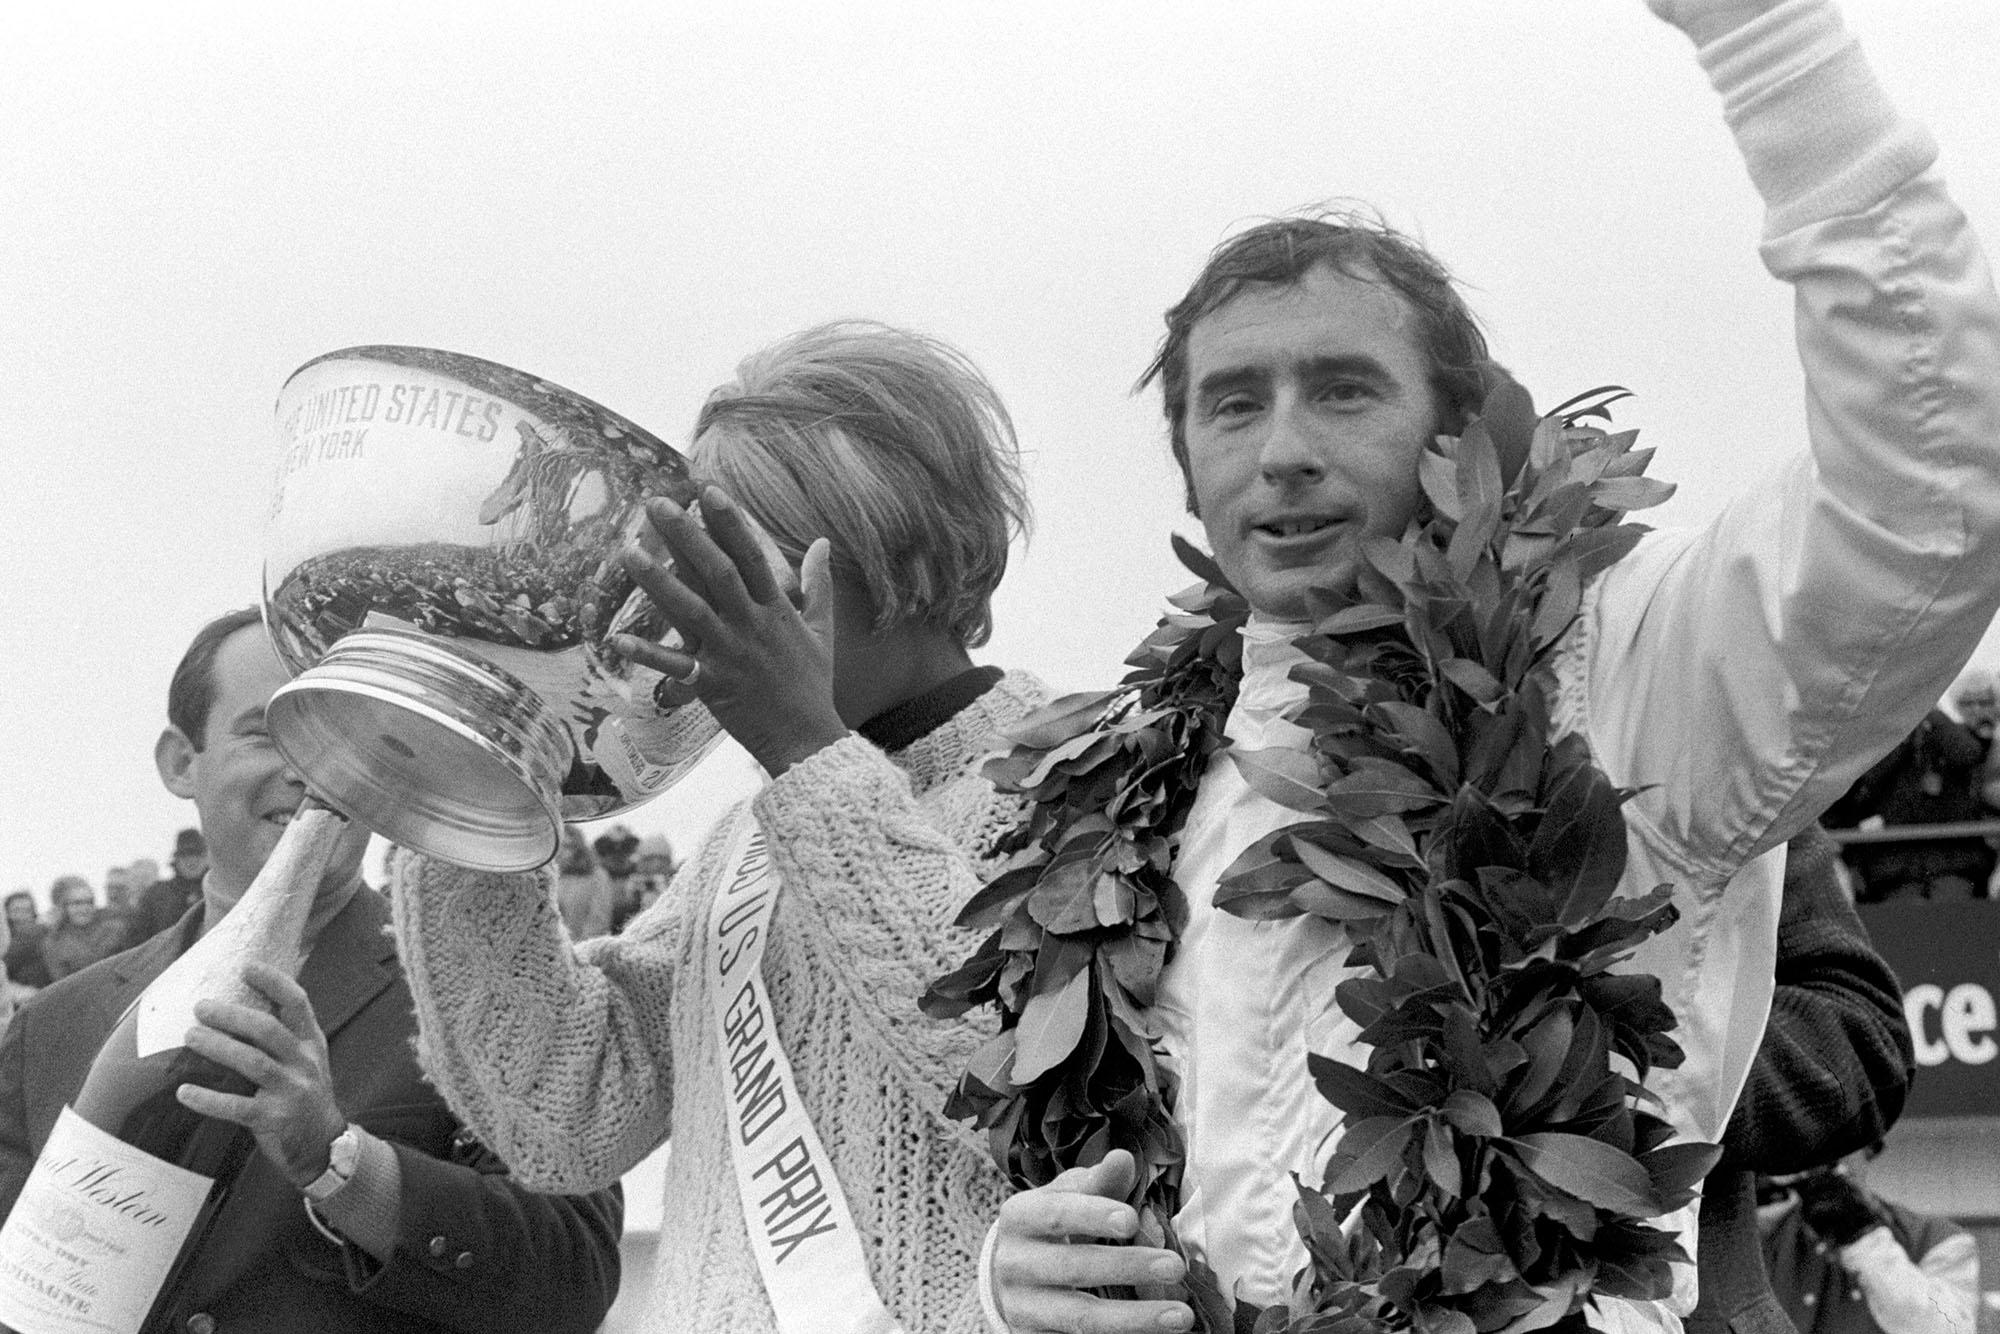 Jackie Stewart celebrates on the podium at the 1968 United States Grand Prix.